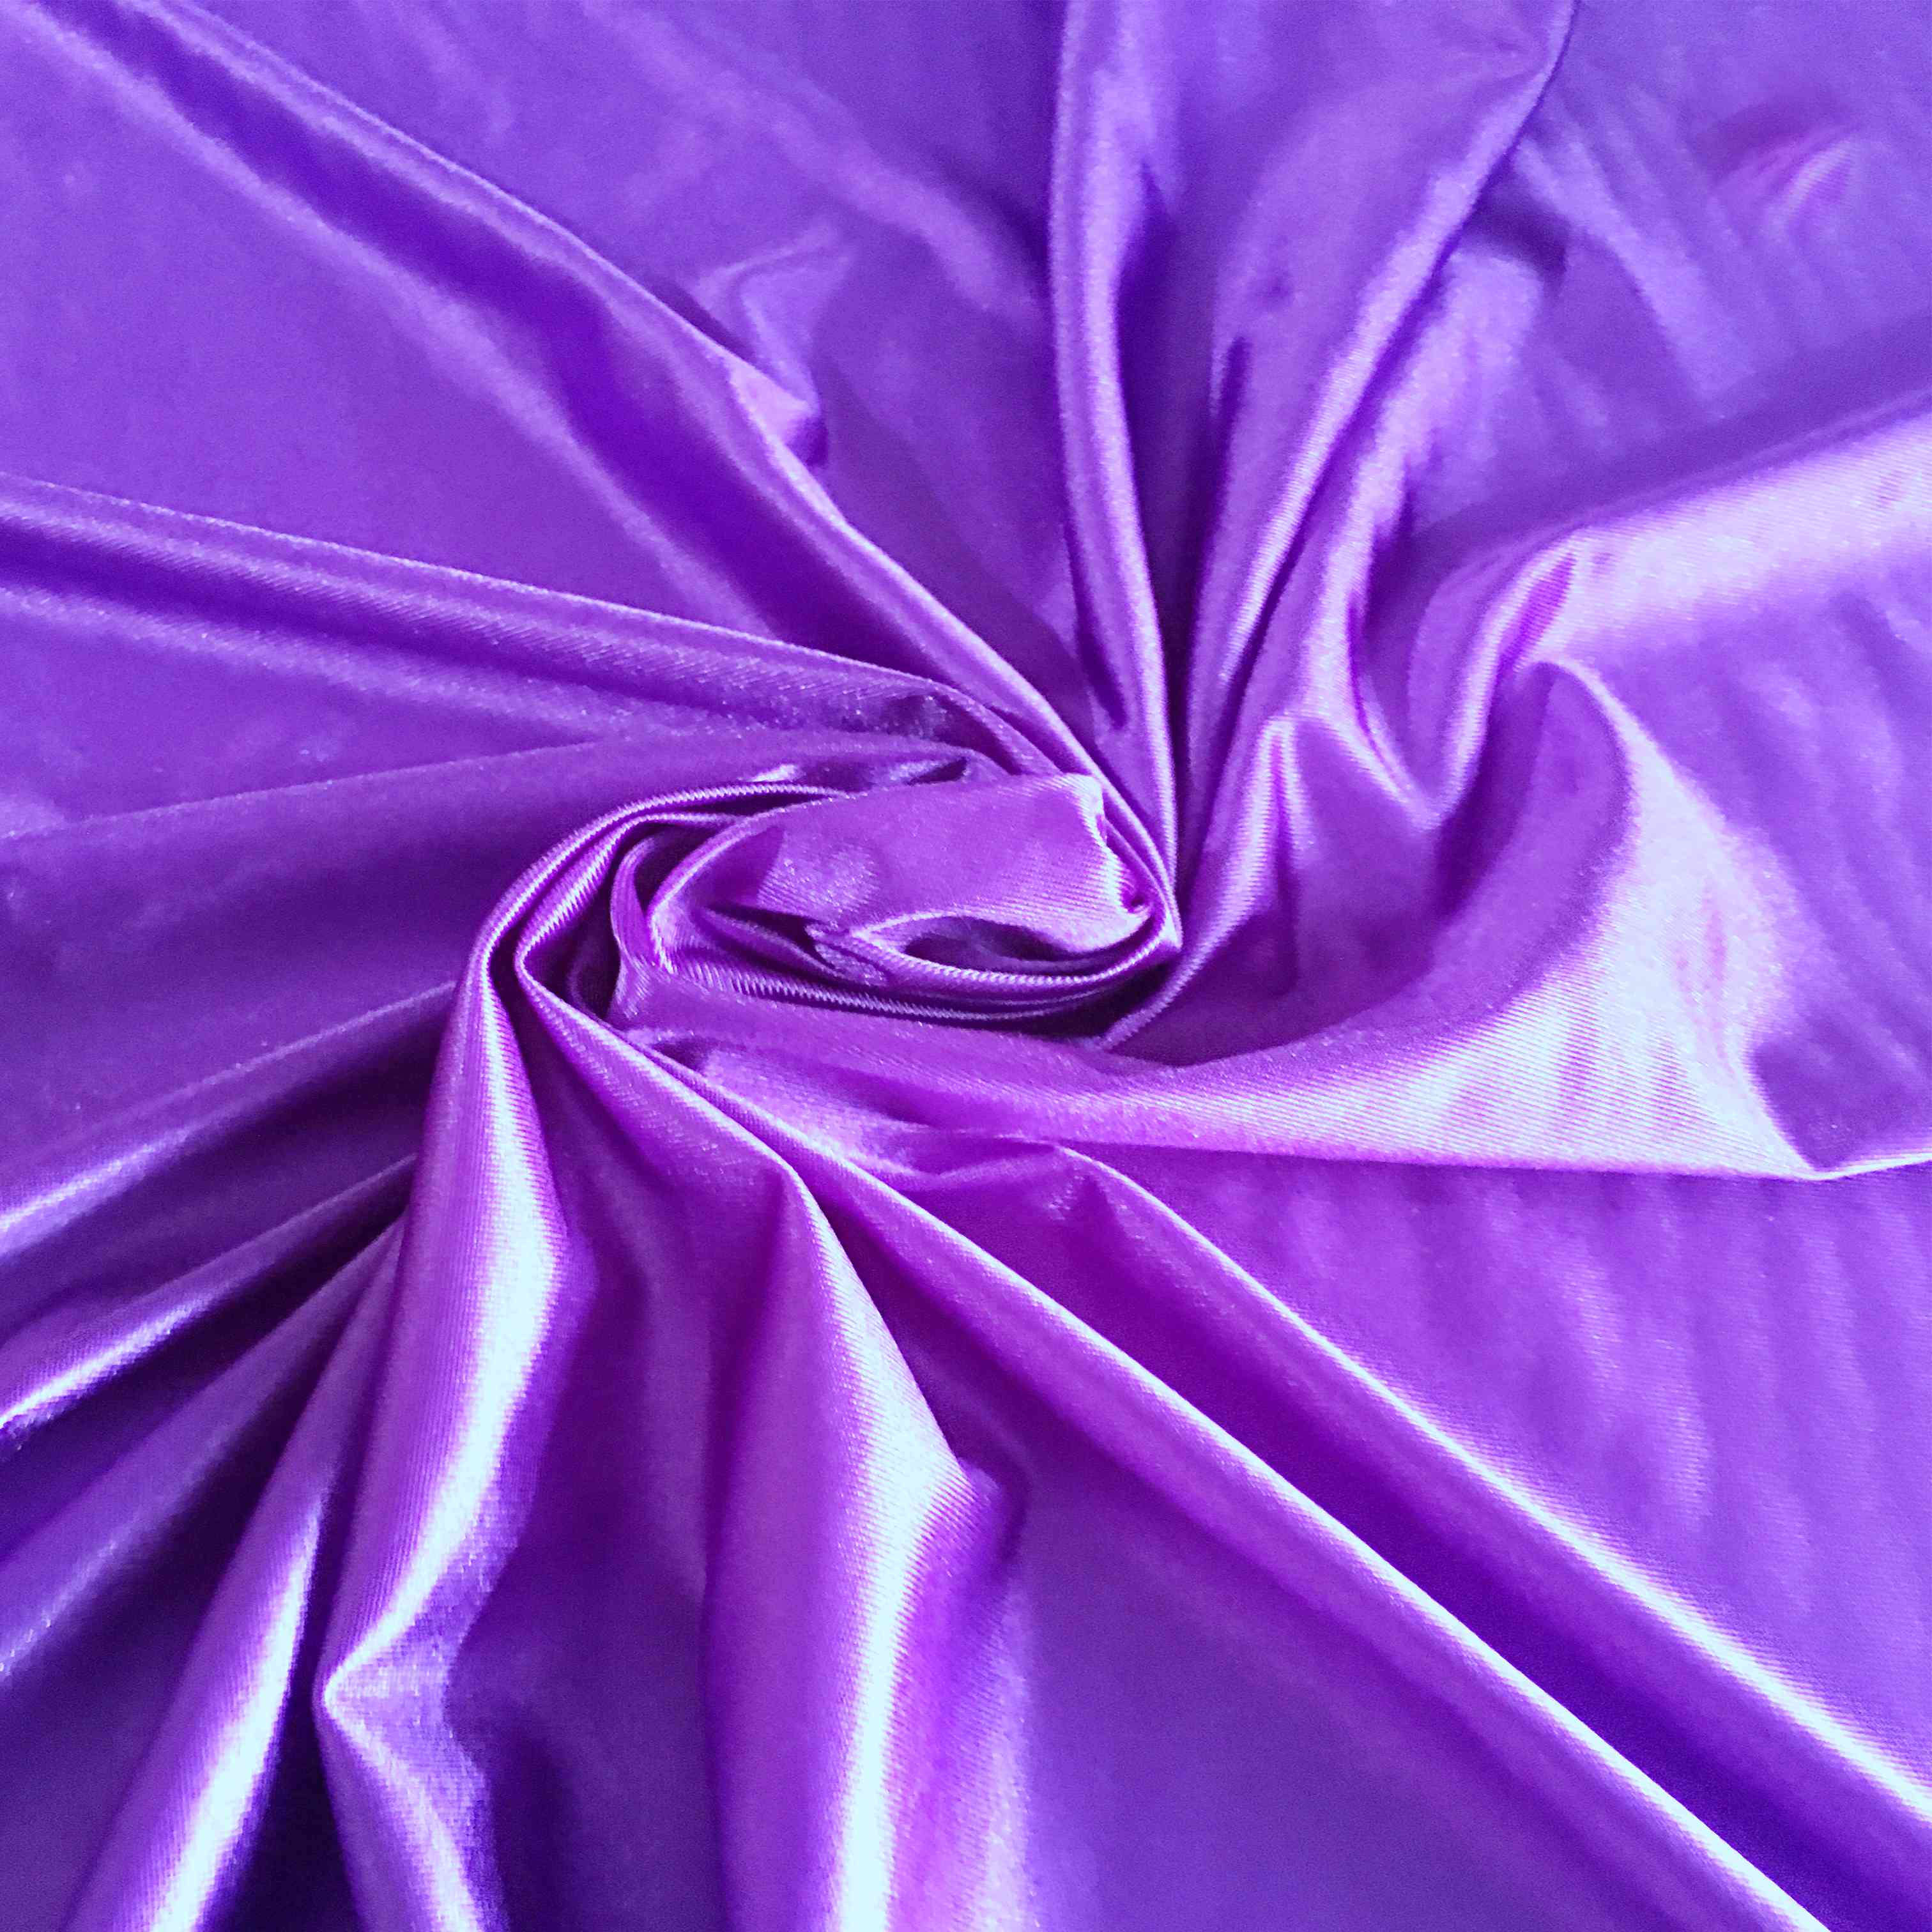 Lionel lilac